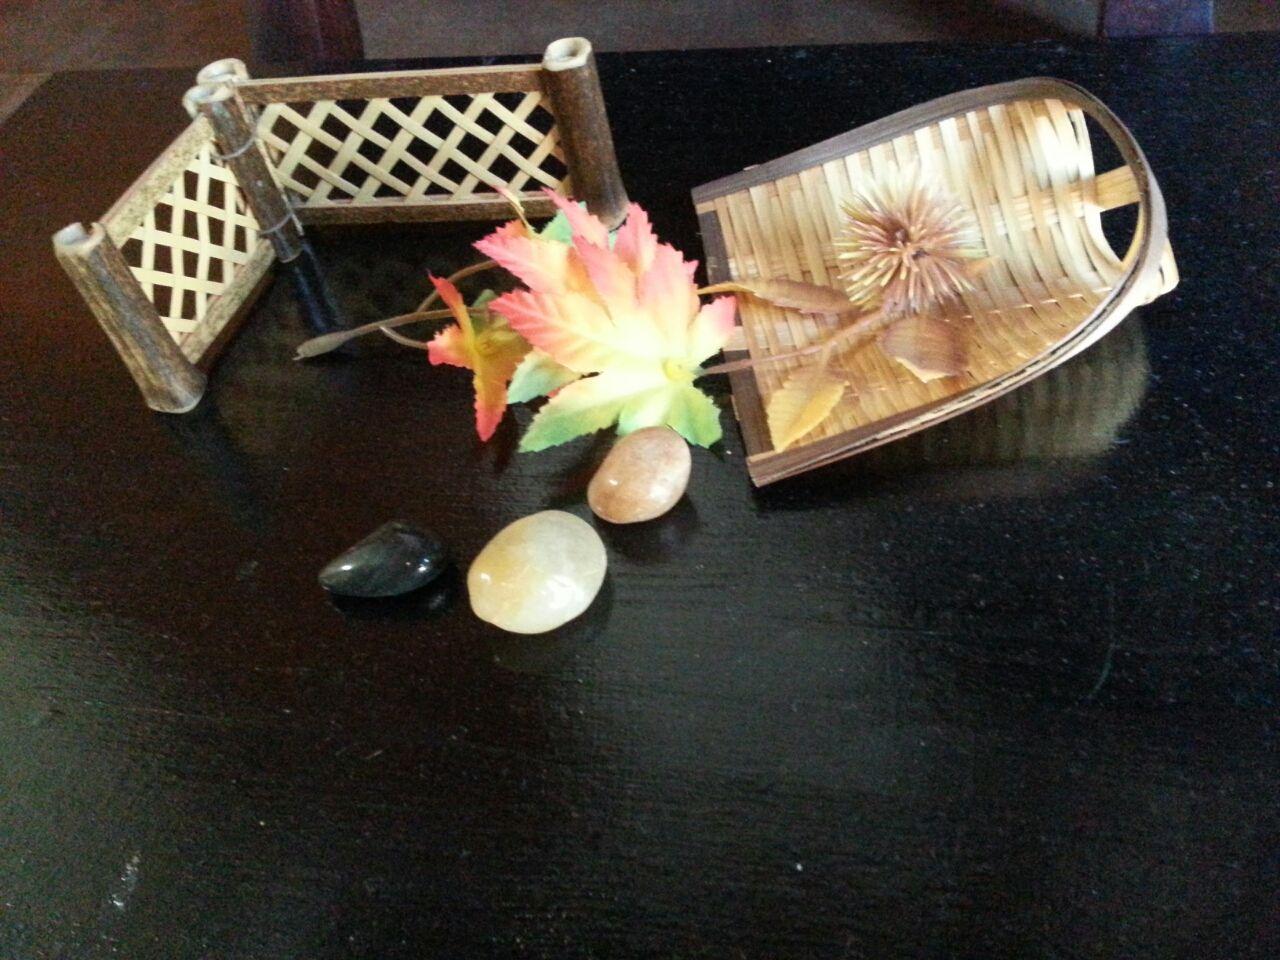 Majakujya(マジャクジャ) 帽子デザイナー山本正子七夕飾りに揺れる鎌倉で帽子の展示会中。歌舞伎座ギャラリーに毛利巨男先生の美学を観に行きました。富士山を見ながら鎌倉に帰って来ました。